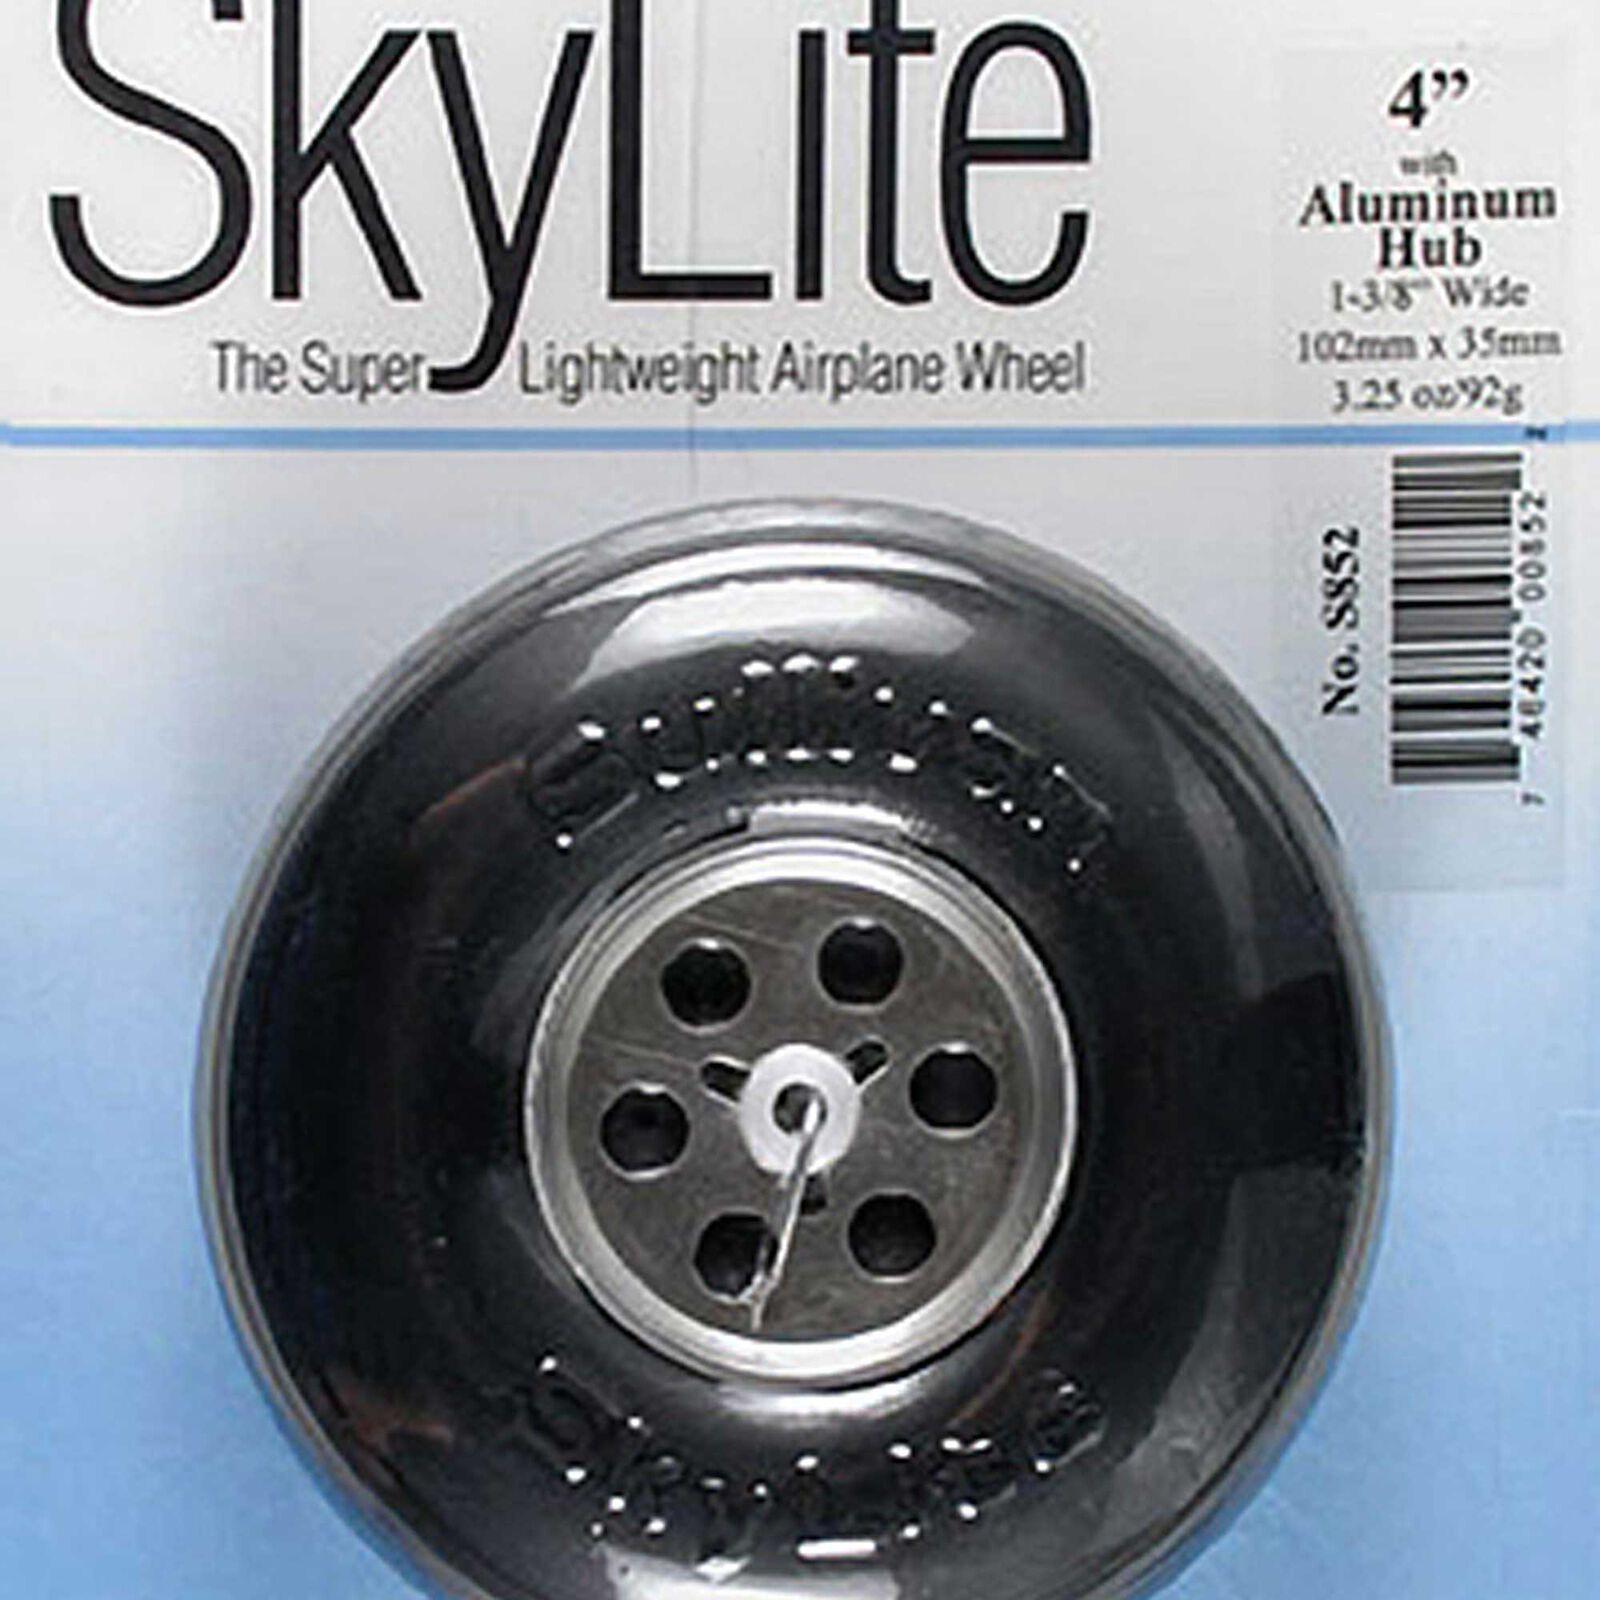 "Sky Wheel with Aluminum Hub, 4"""